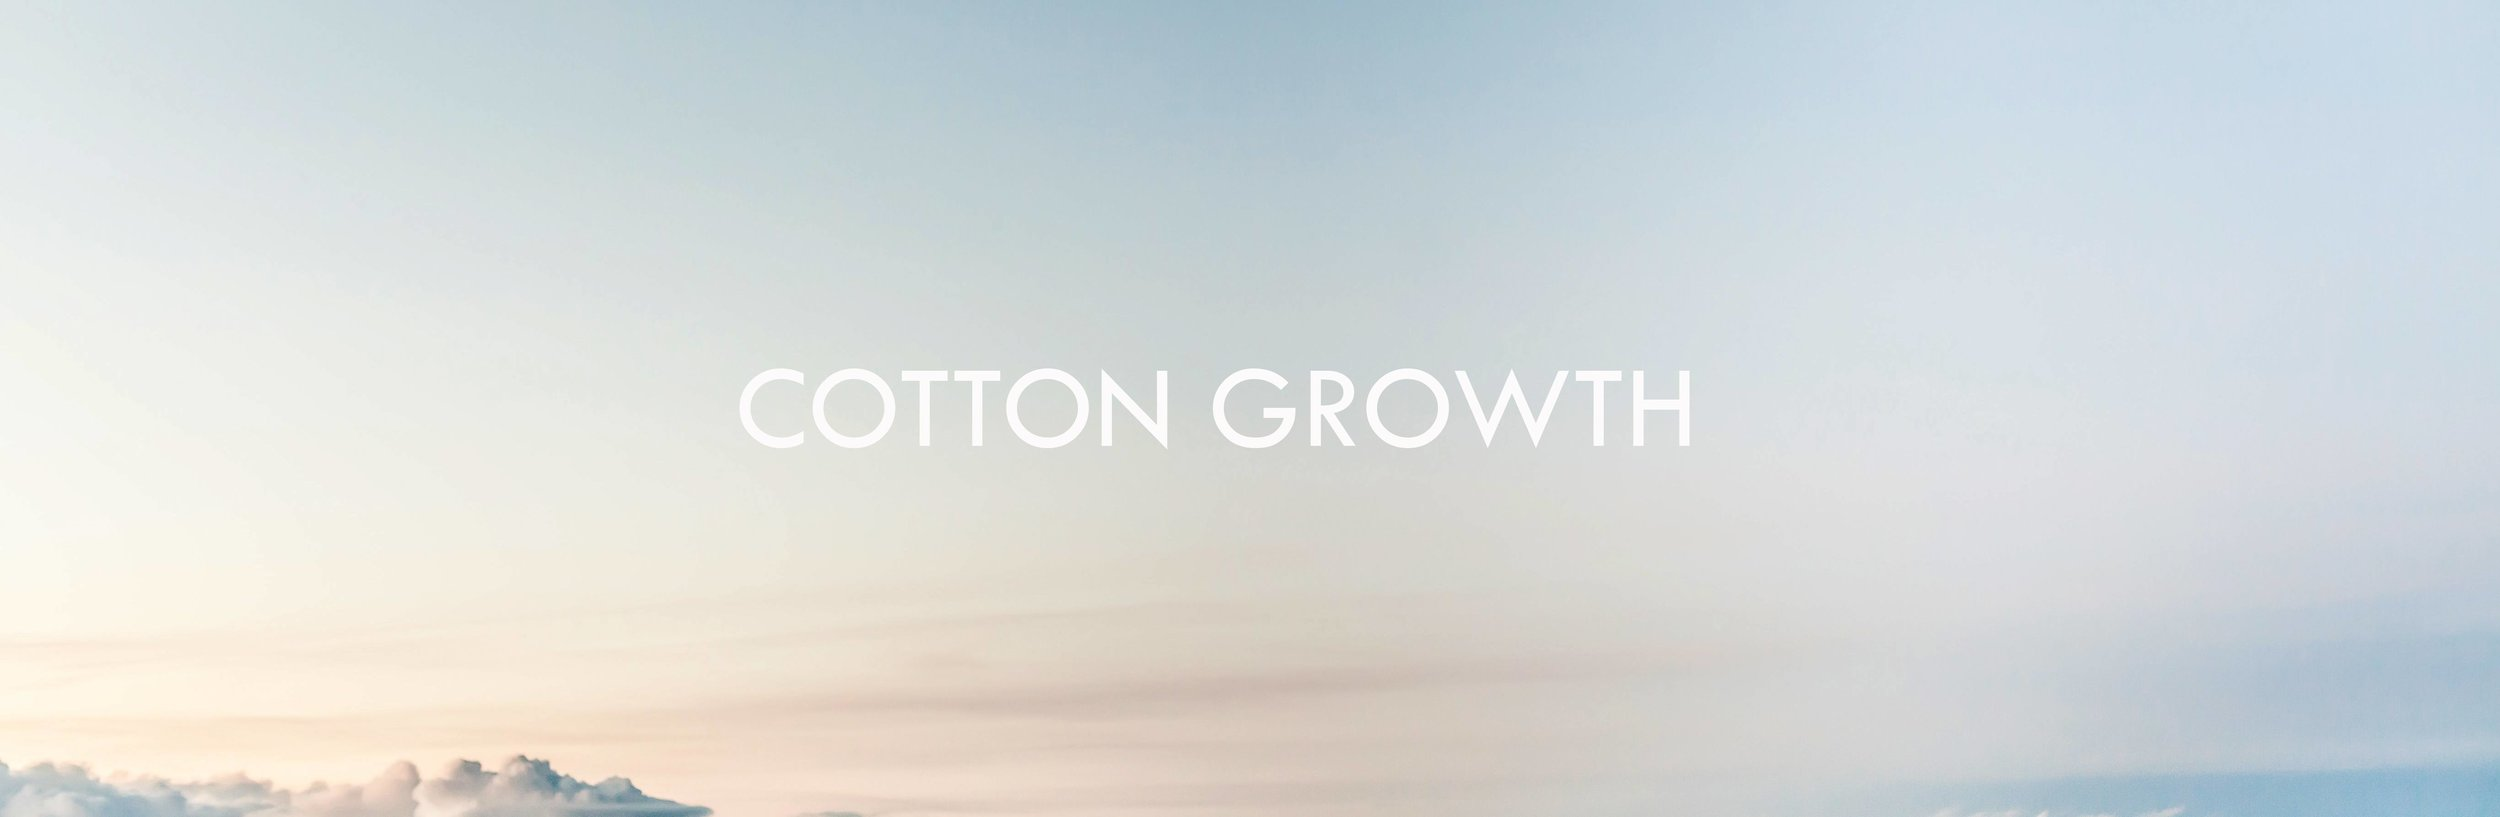 cotton_growth_final.jpg